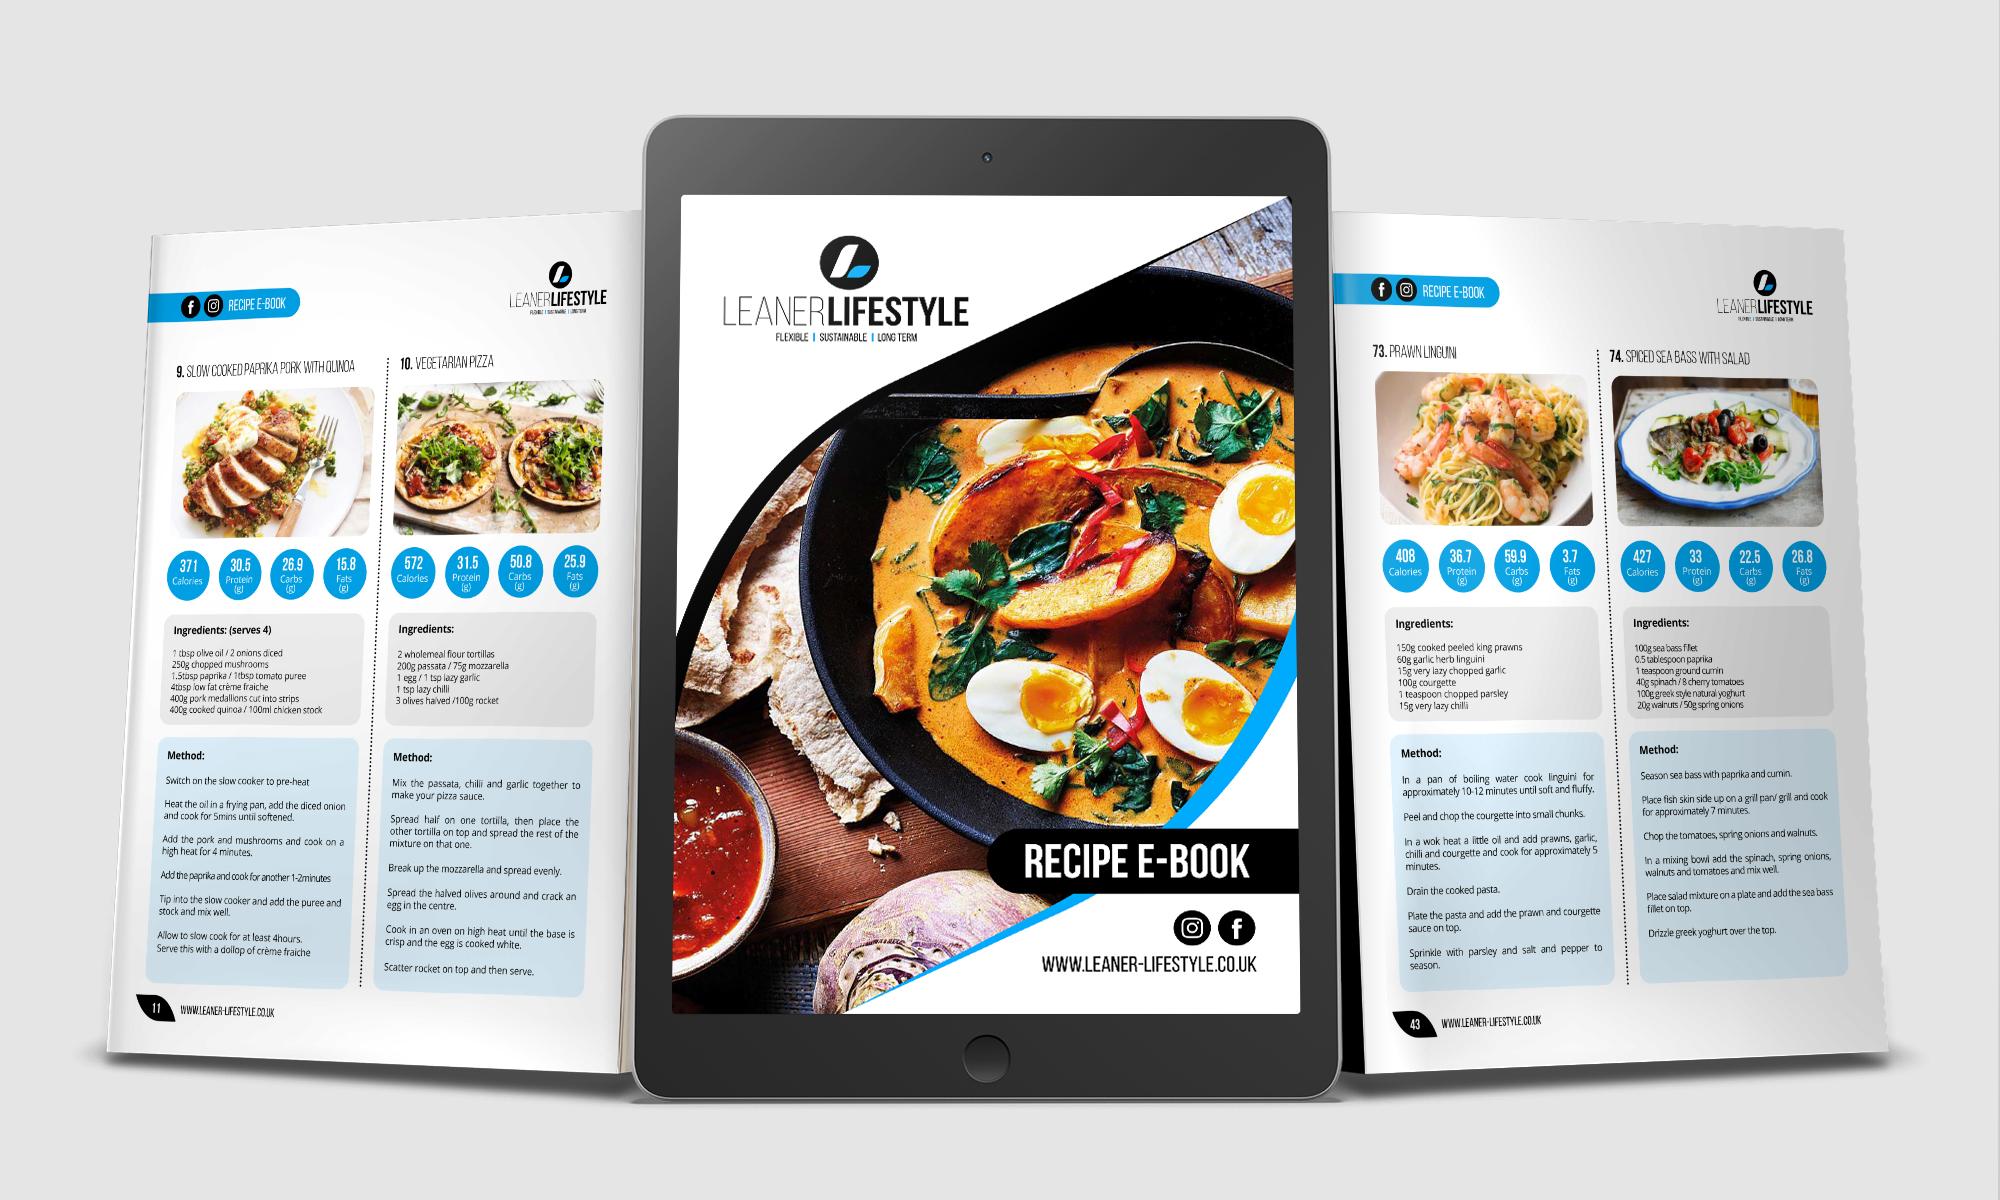 Leaner Lifestyle e-book Mockup